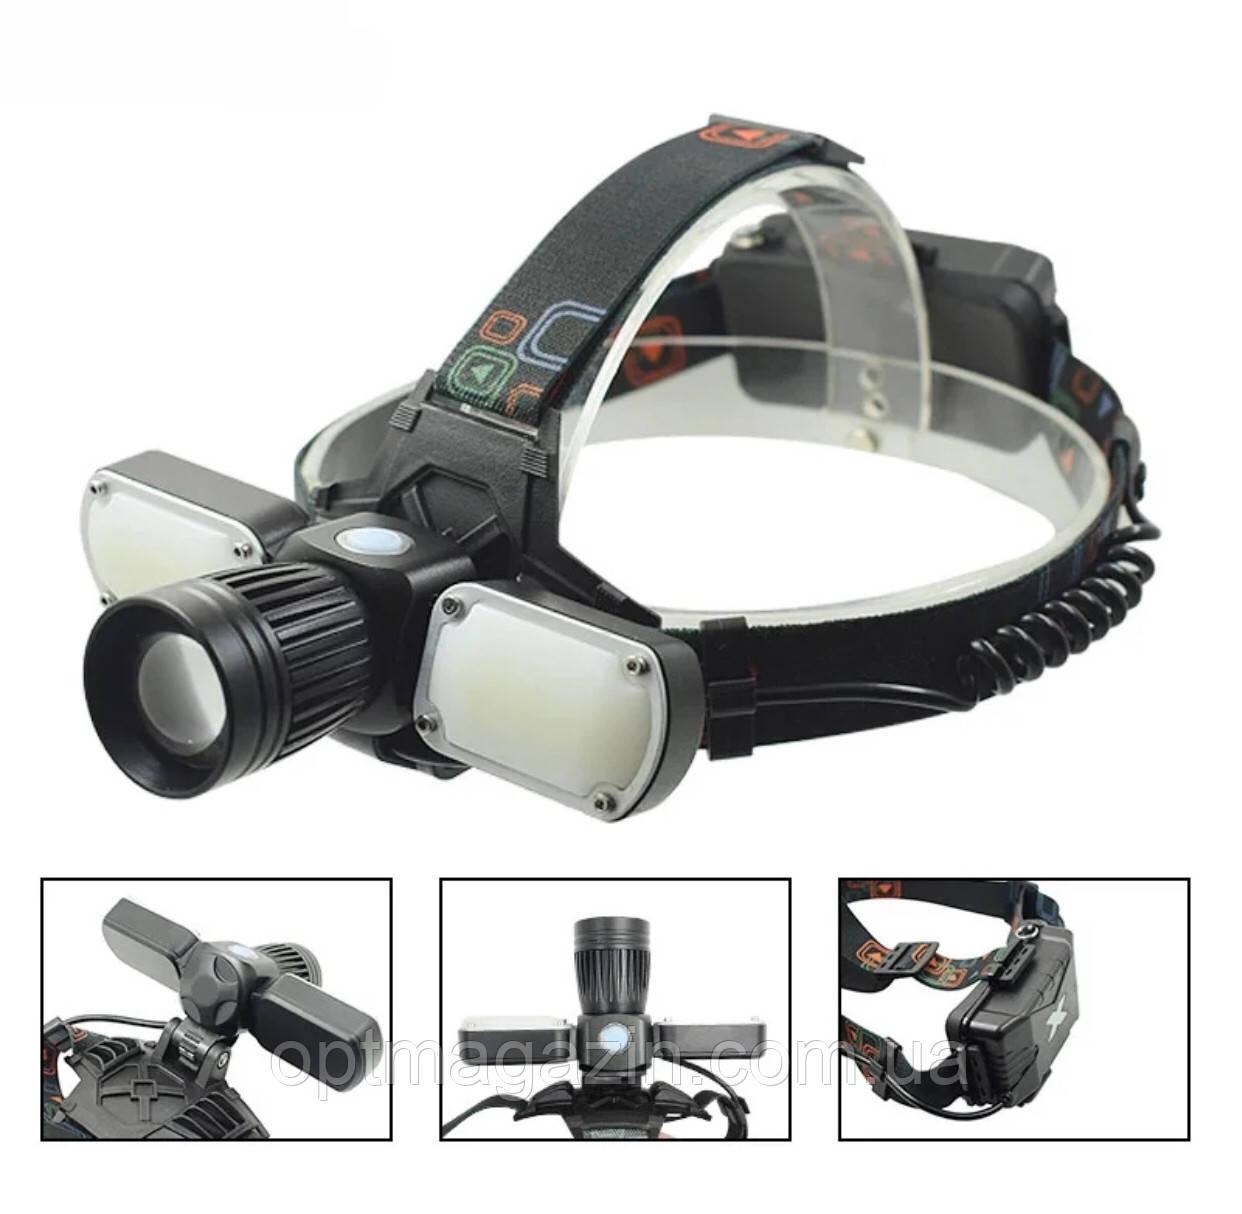 Ліхтар налобний Garden Light 626-T6 +USB кабель